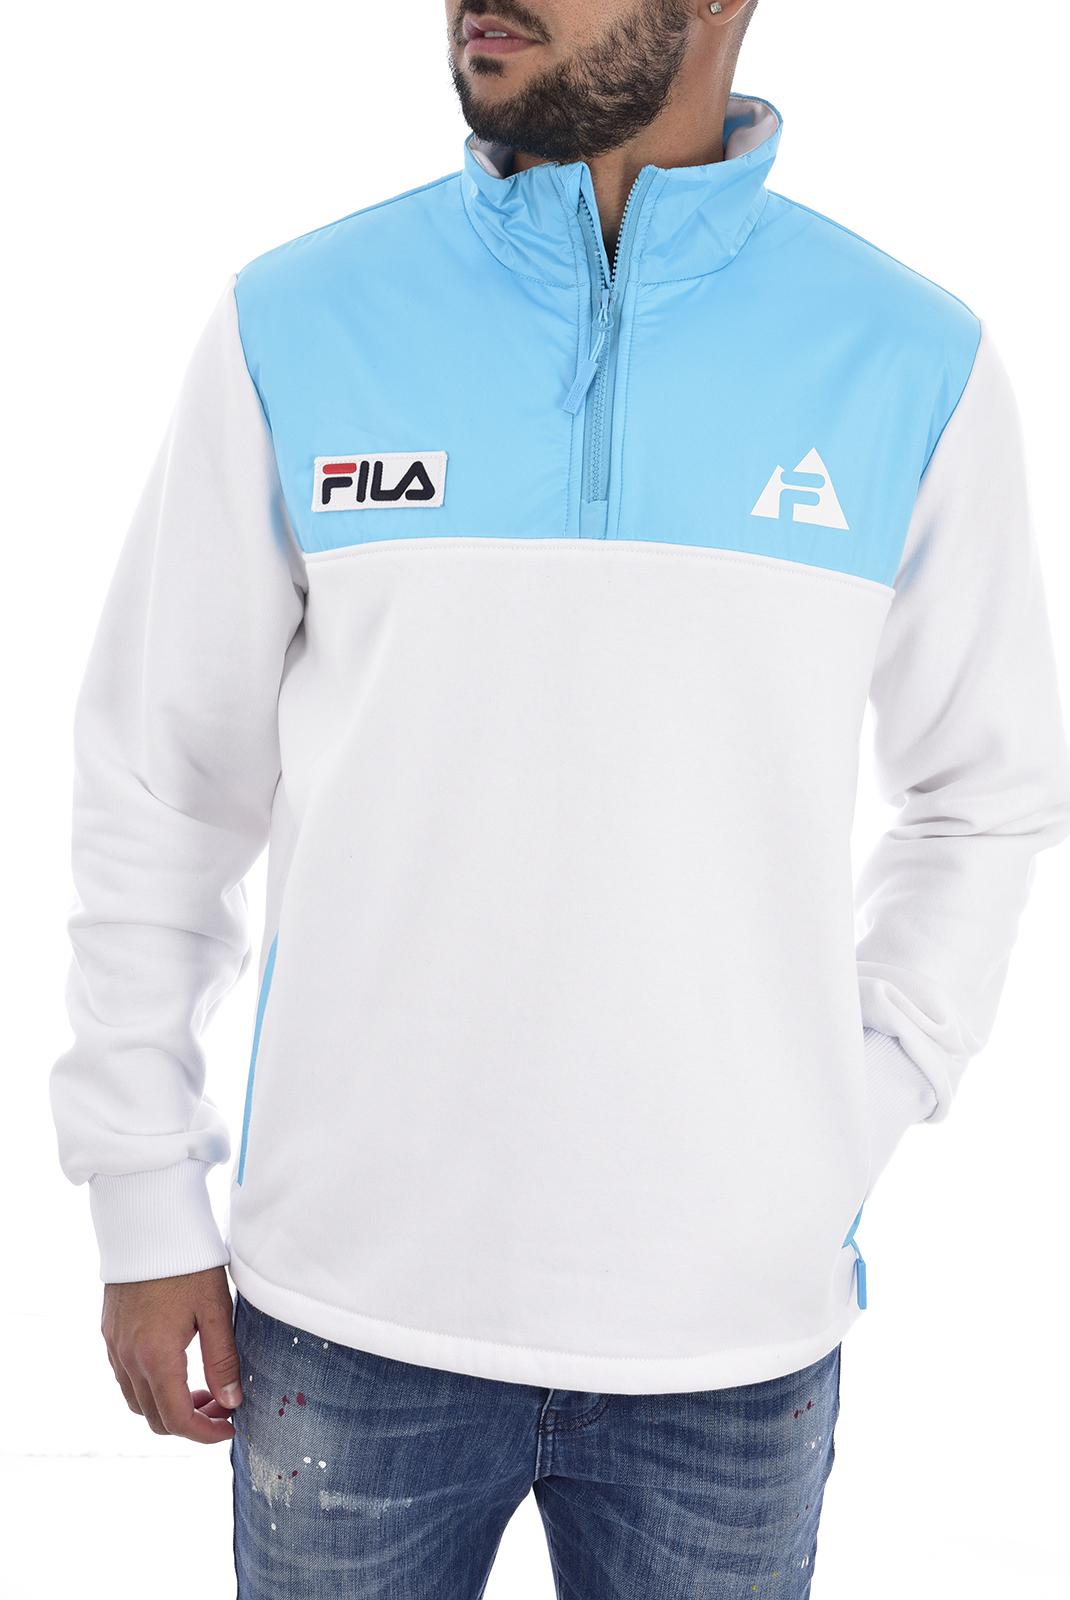 Sweatshirts  Fila 687018 AIDEN A276 bright white-blue atoll